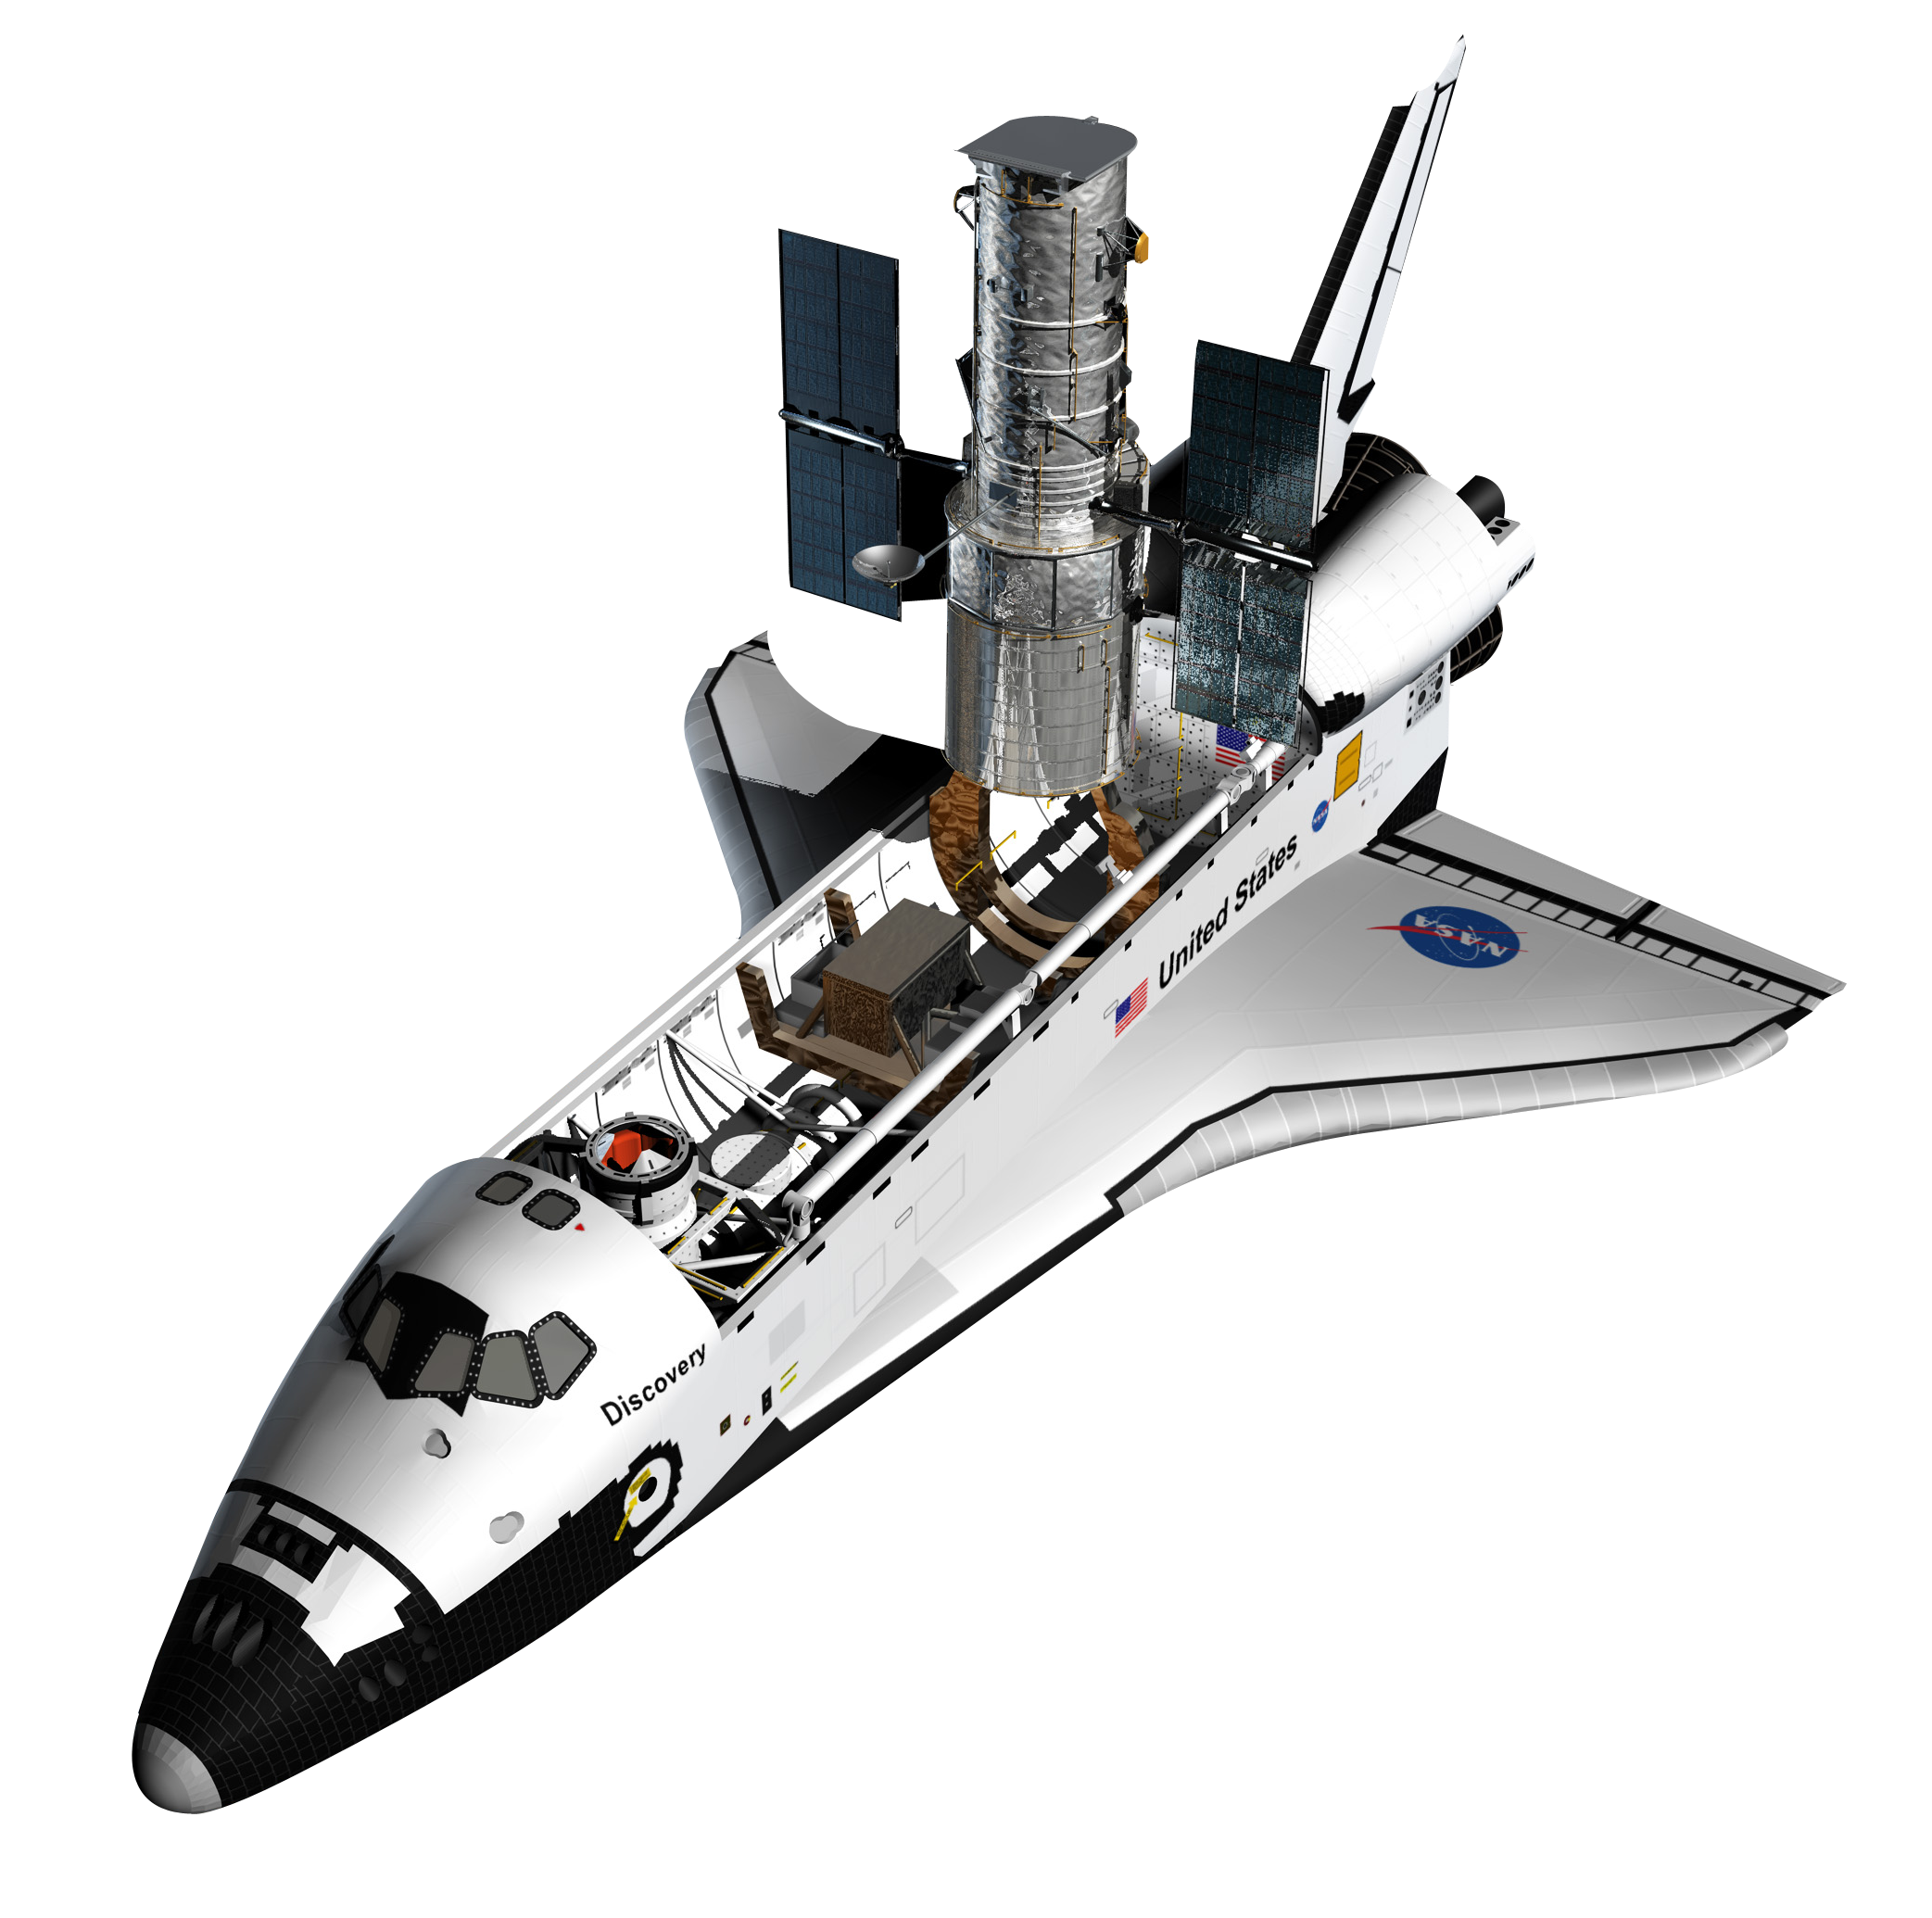 Battleship clipart transparent background. Space shuttle png image